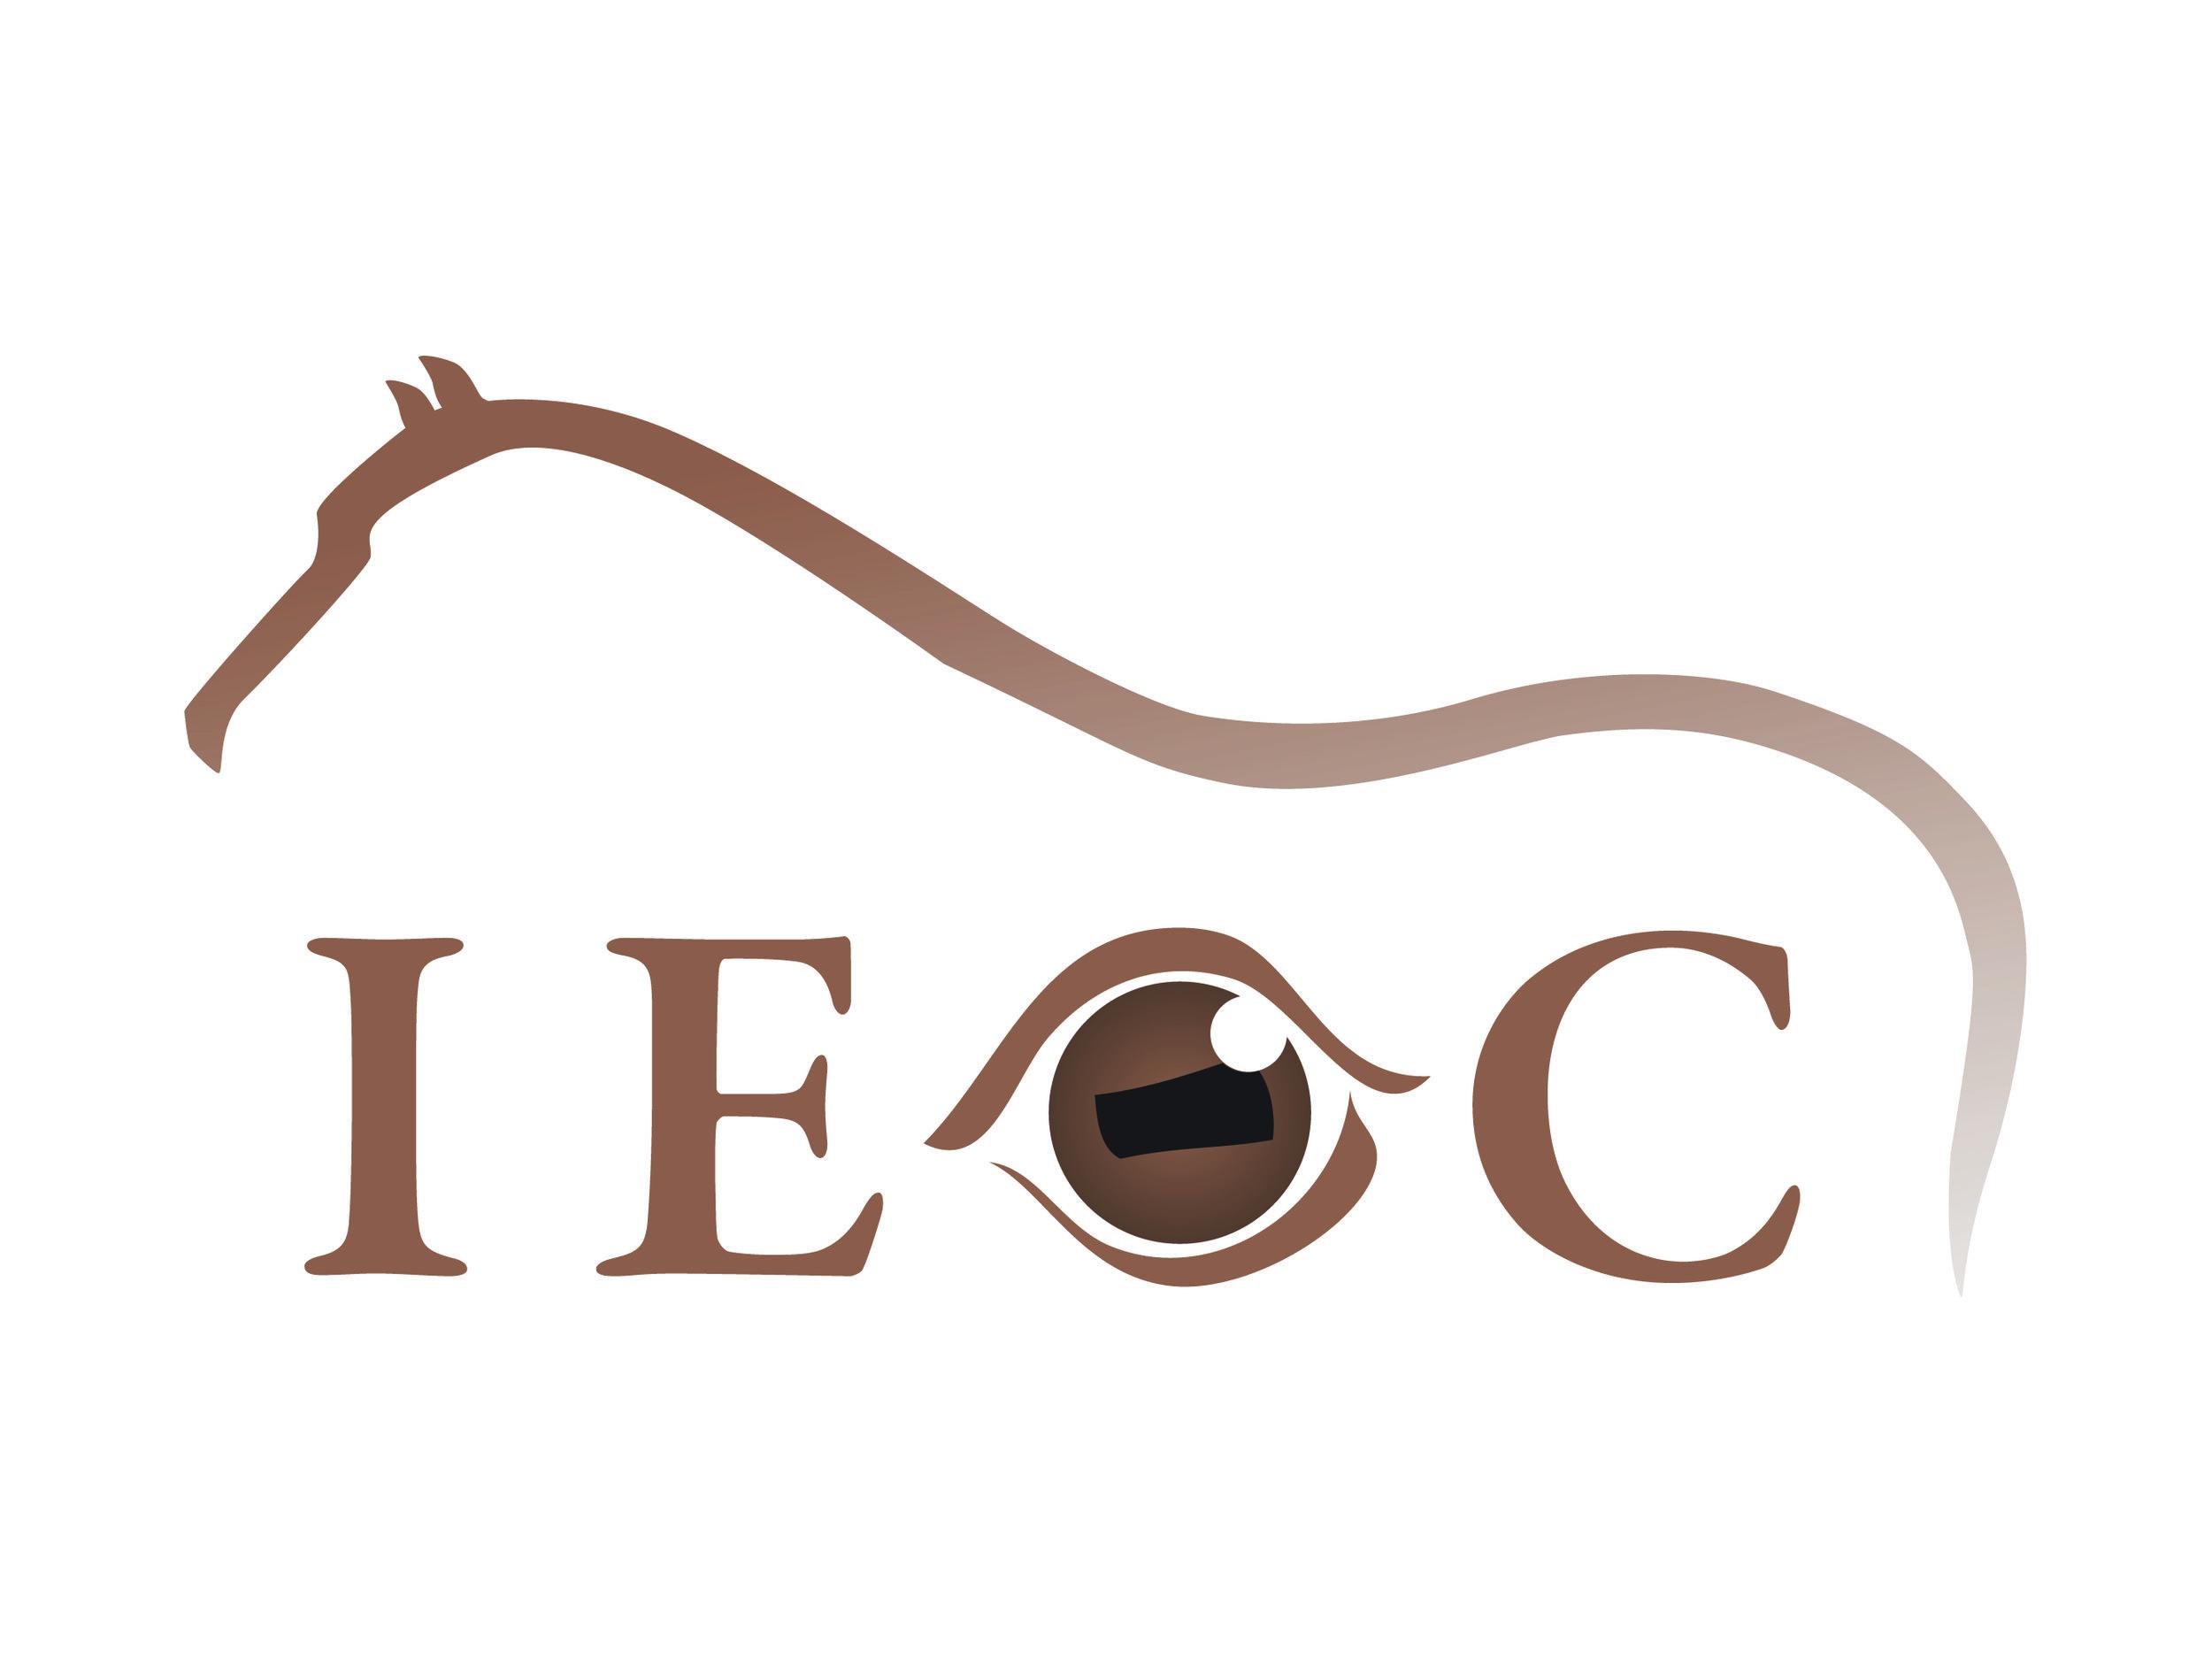 IEOC_logo.jpg